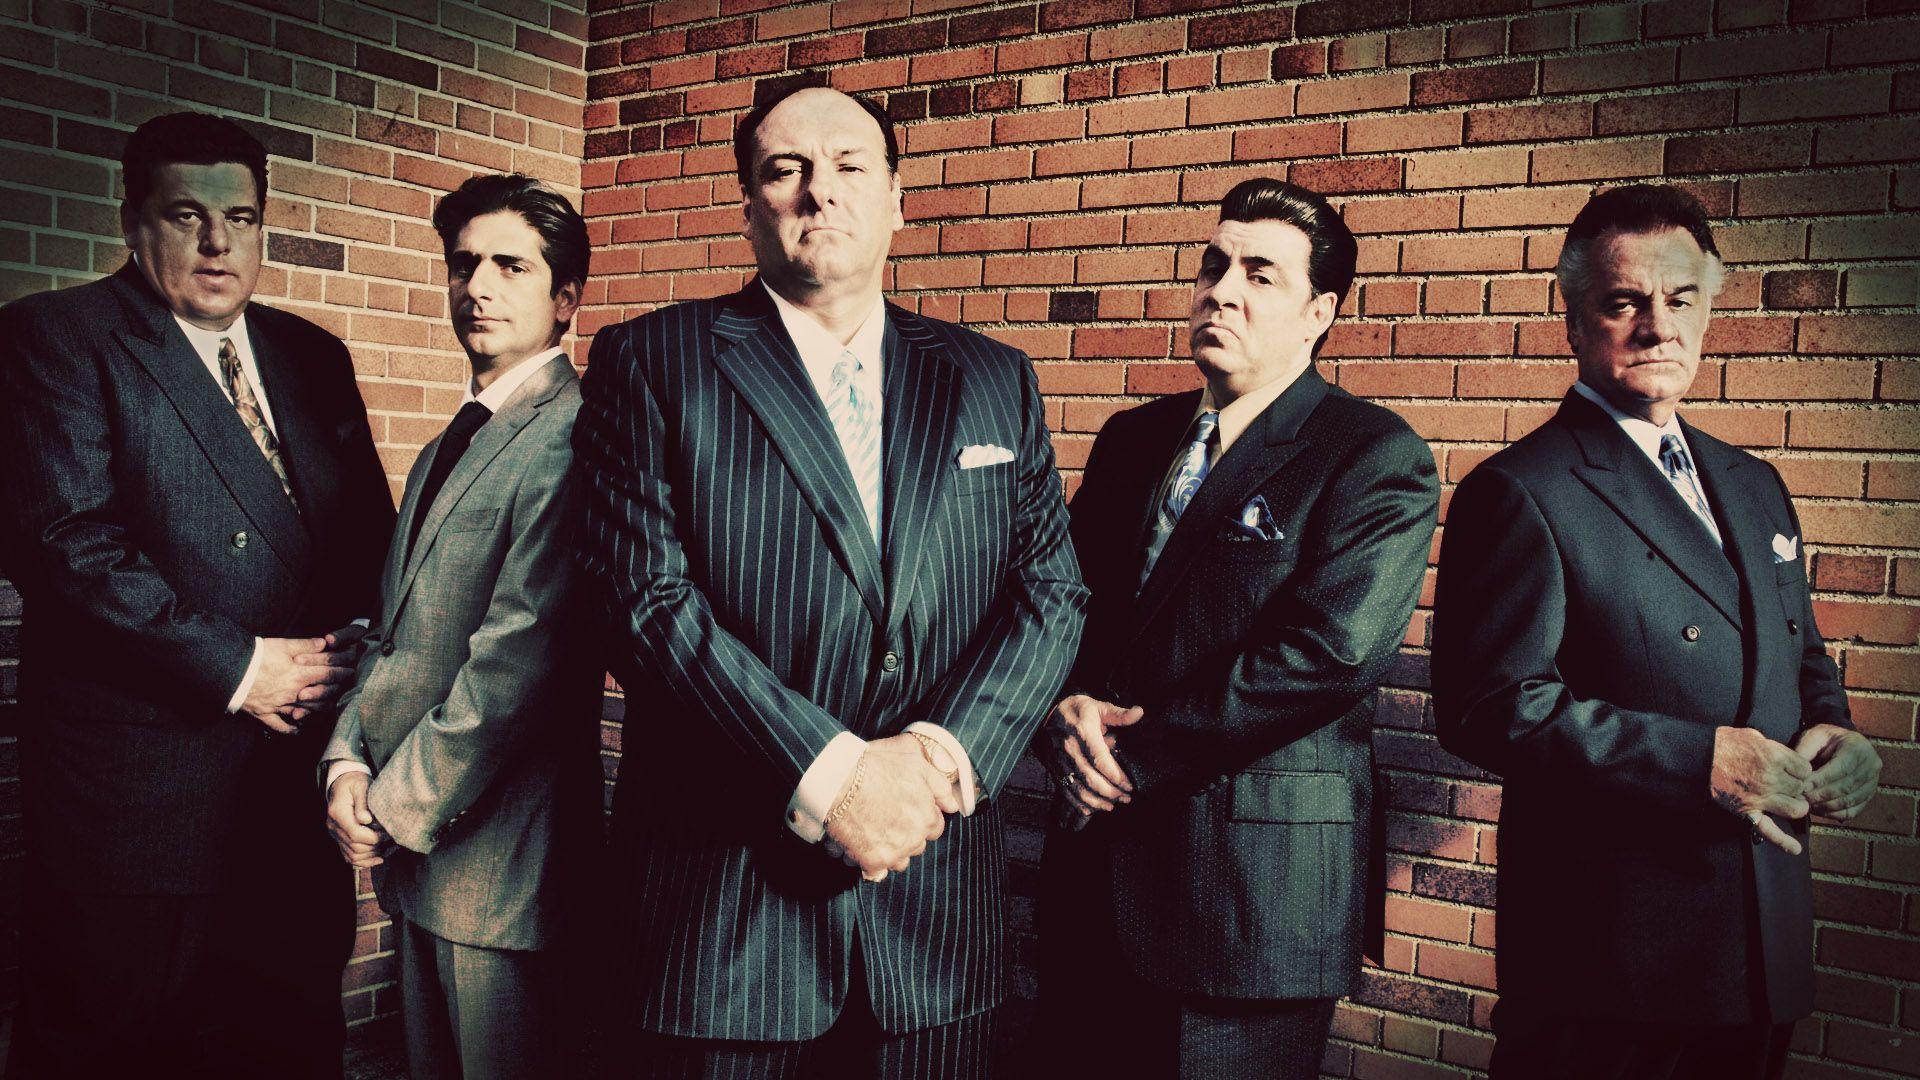 James Gandolfini Tony Soprano Images For Desktop And Wallpaper Sopranos Sopranos Canvas Mafia